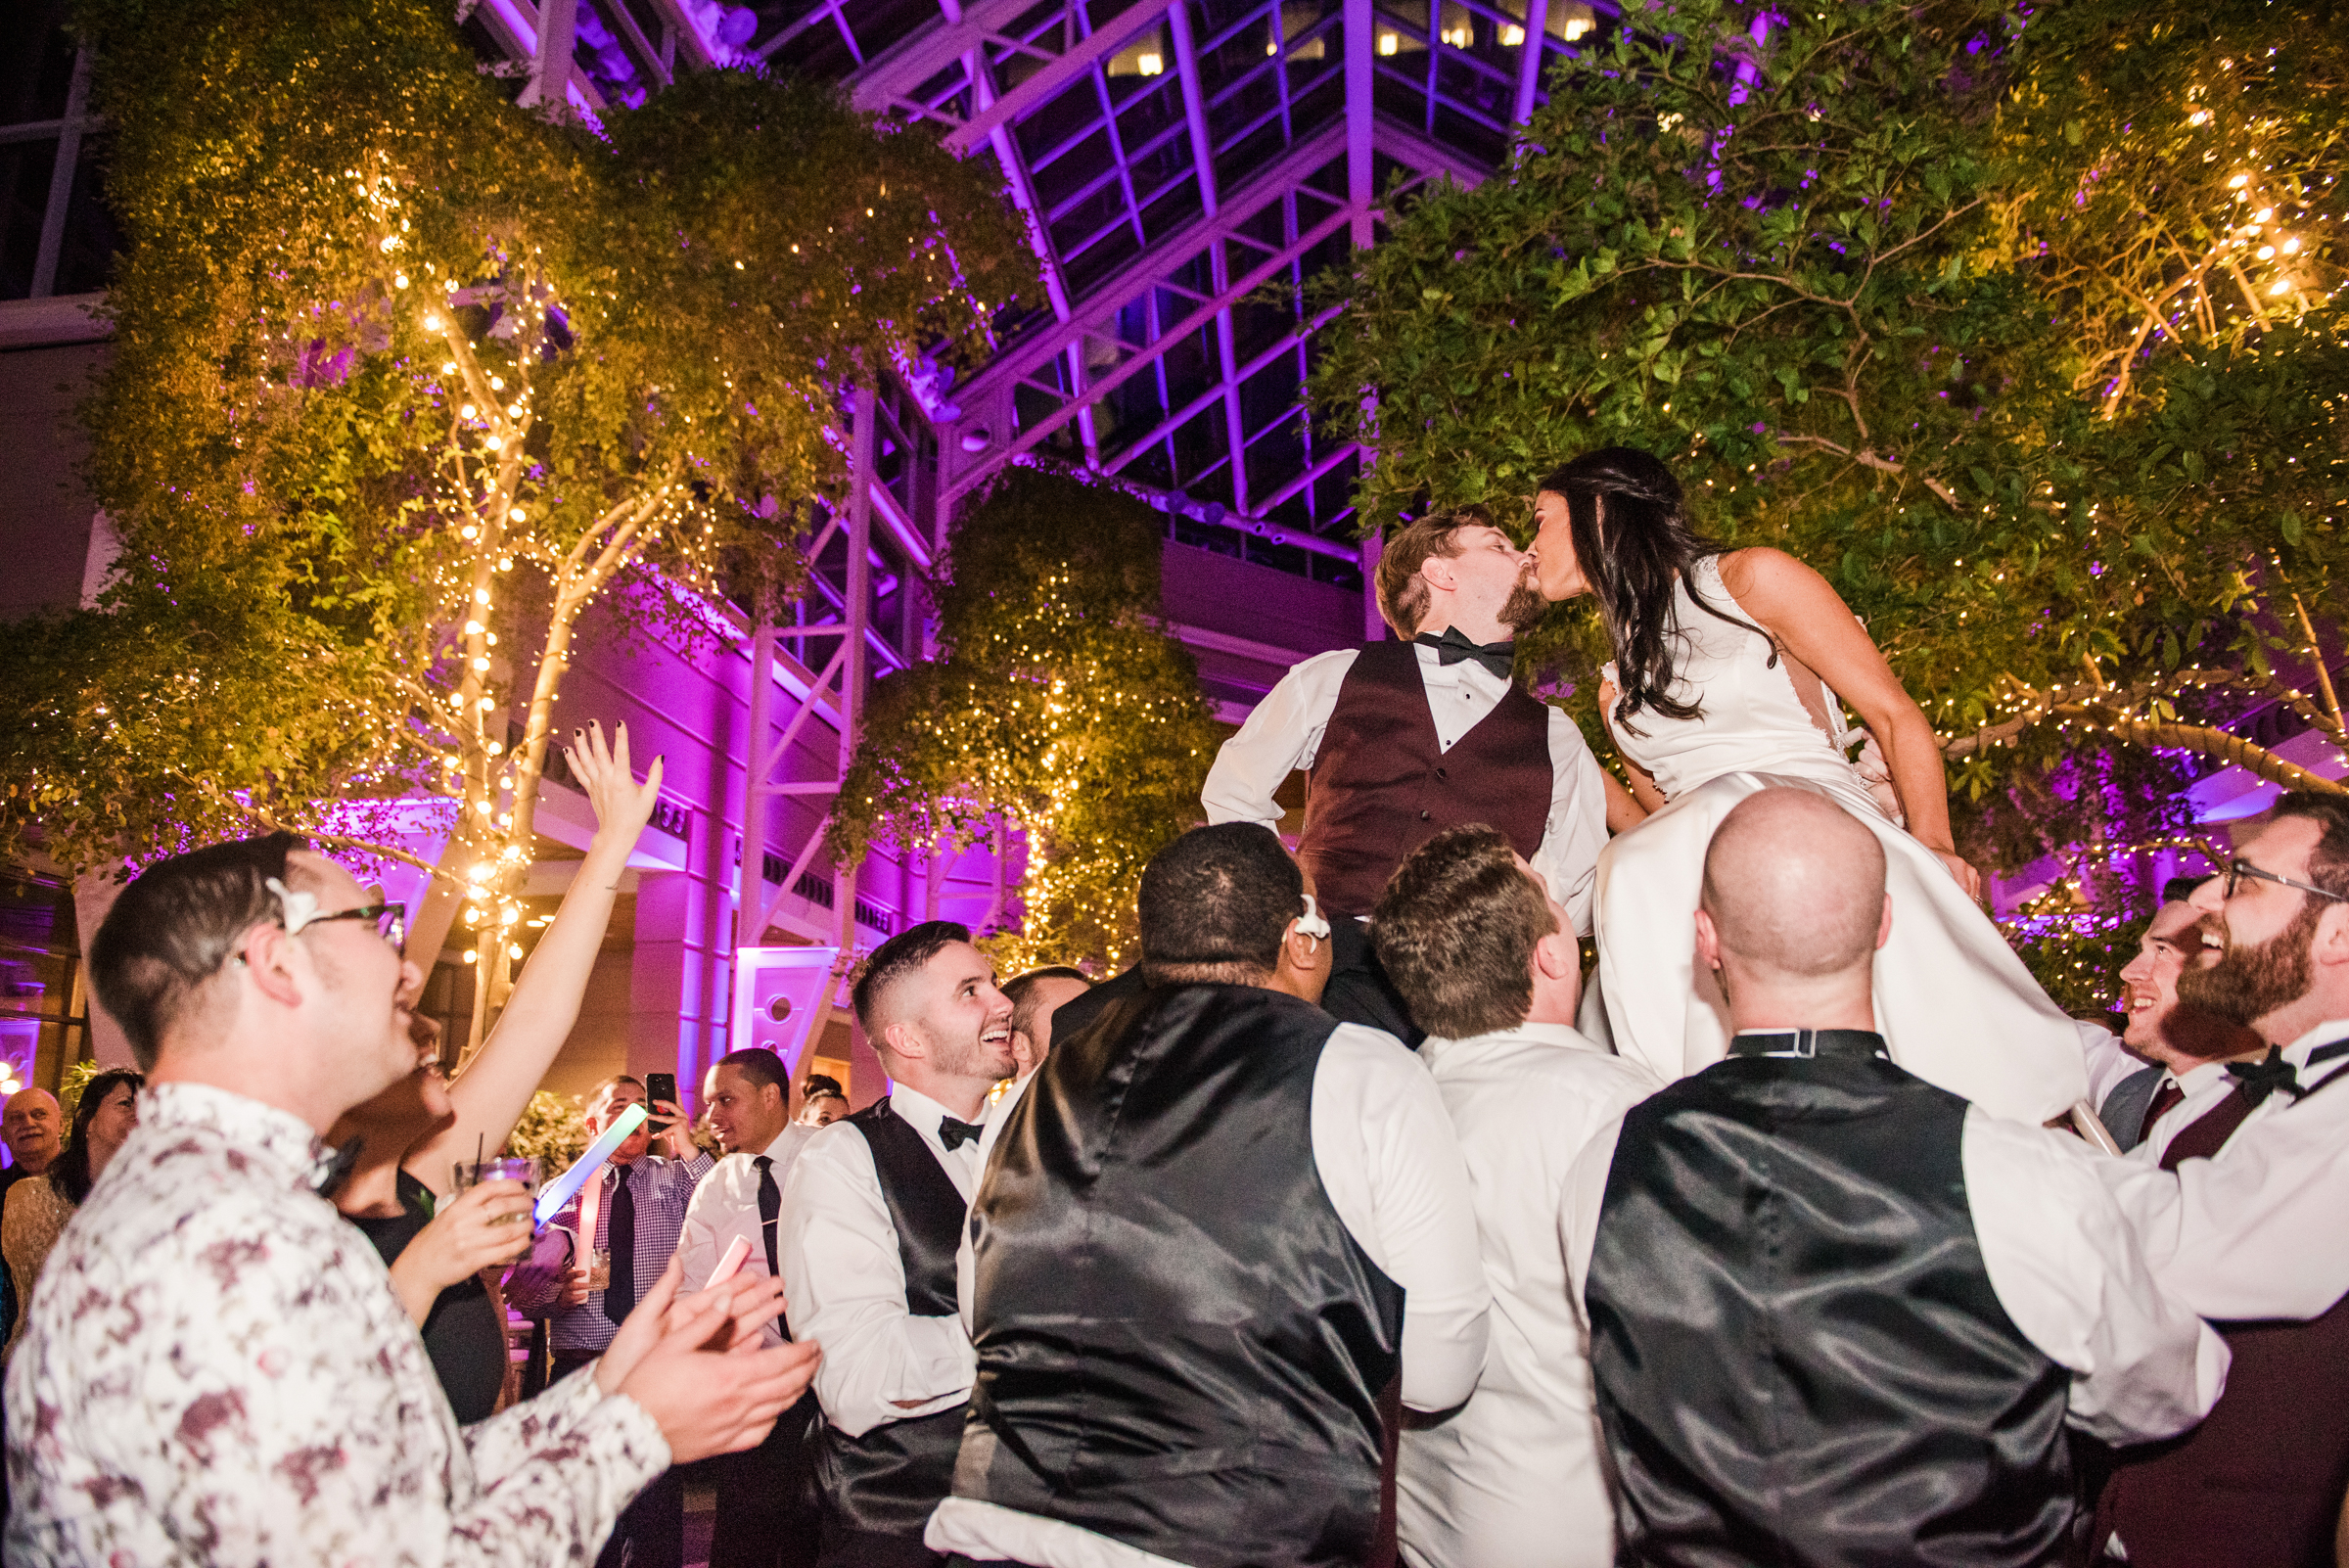 Wintergarden_by_Monroes_Rochester_Wedding_JILL_STUDIO_Rochester_NY_Photographer_221141.jpg